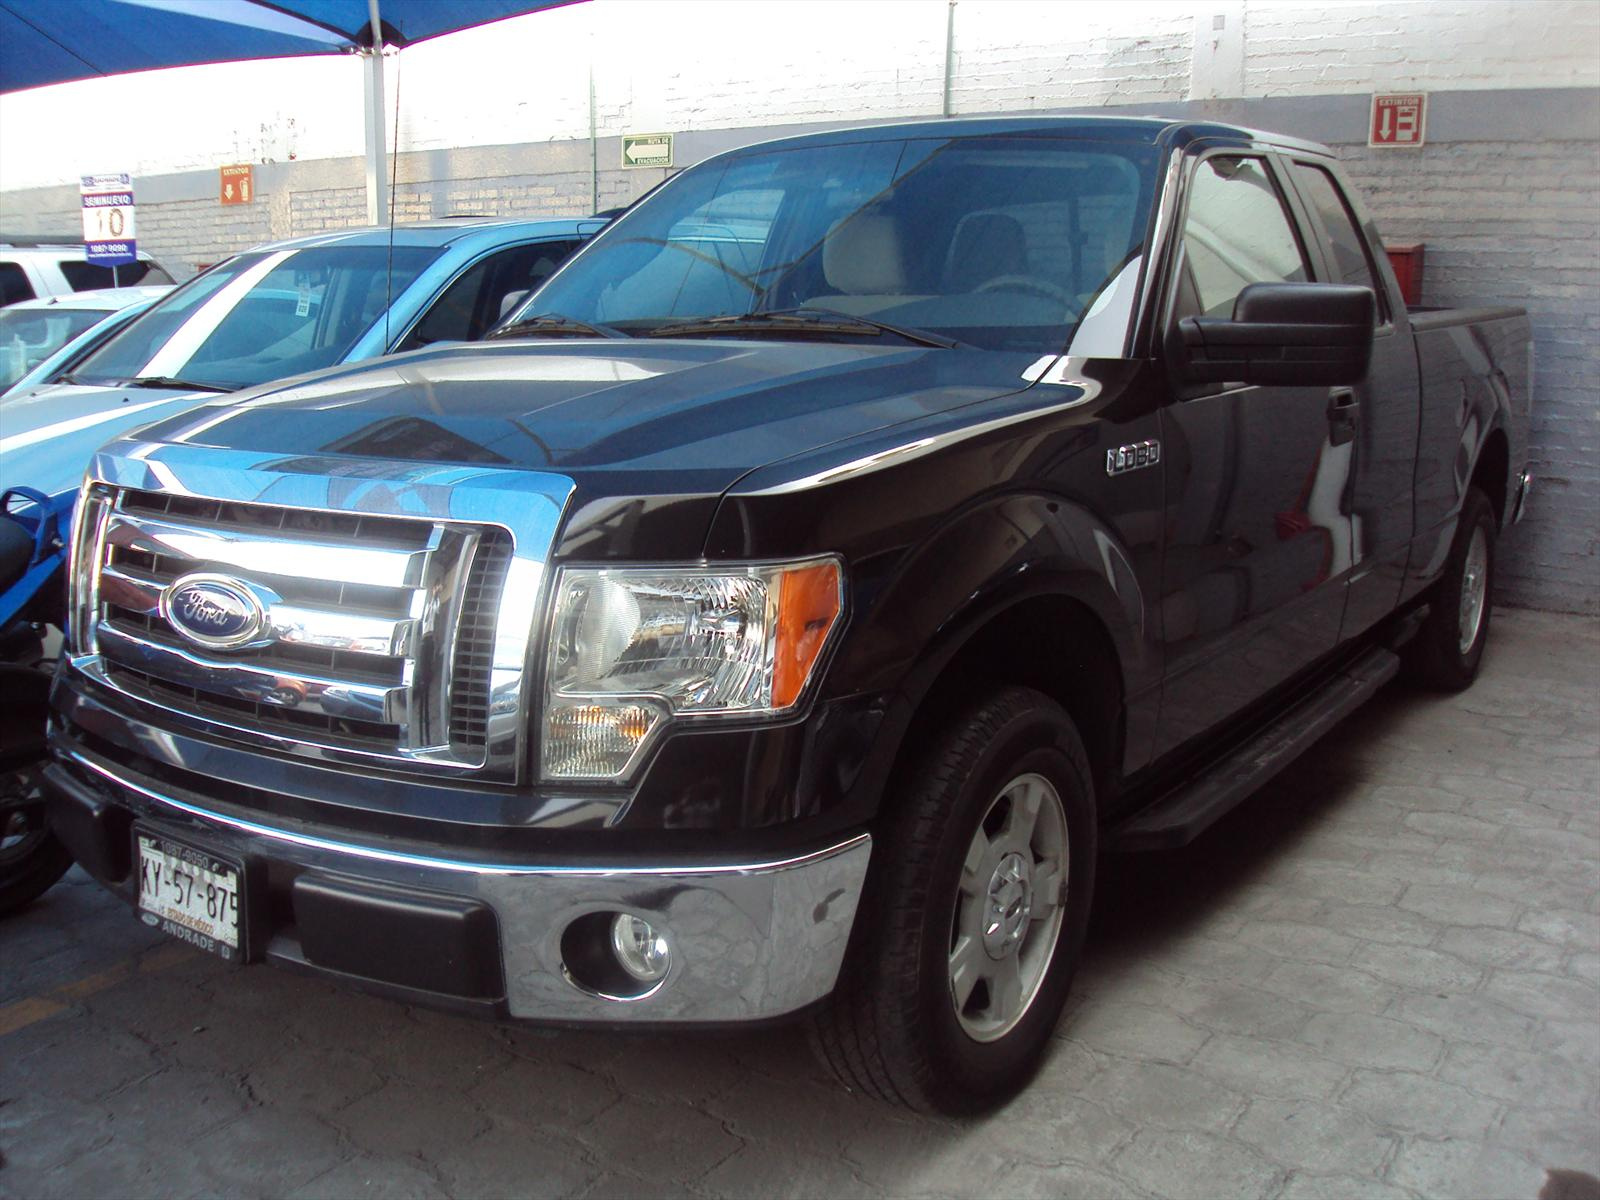 Venta autos usado - Ciudad de Mexico - Ford Lobo XLT 4x2